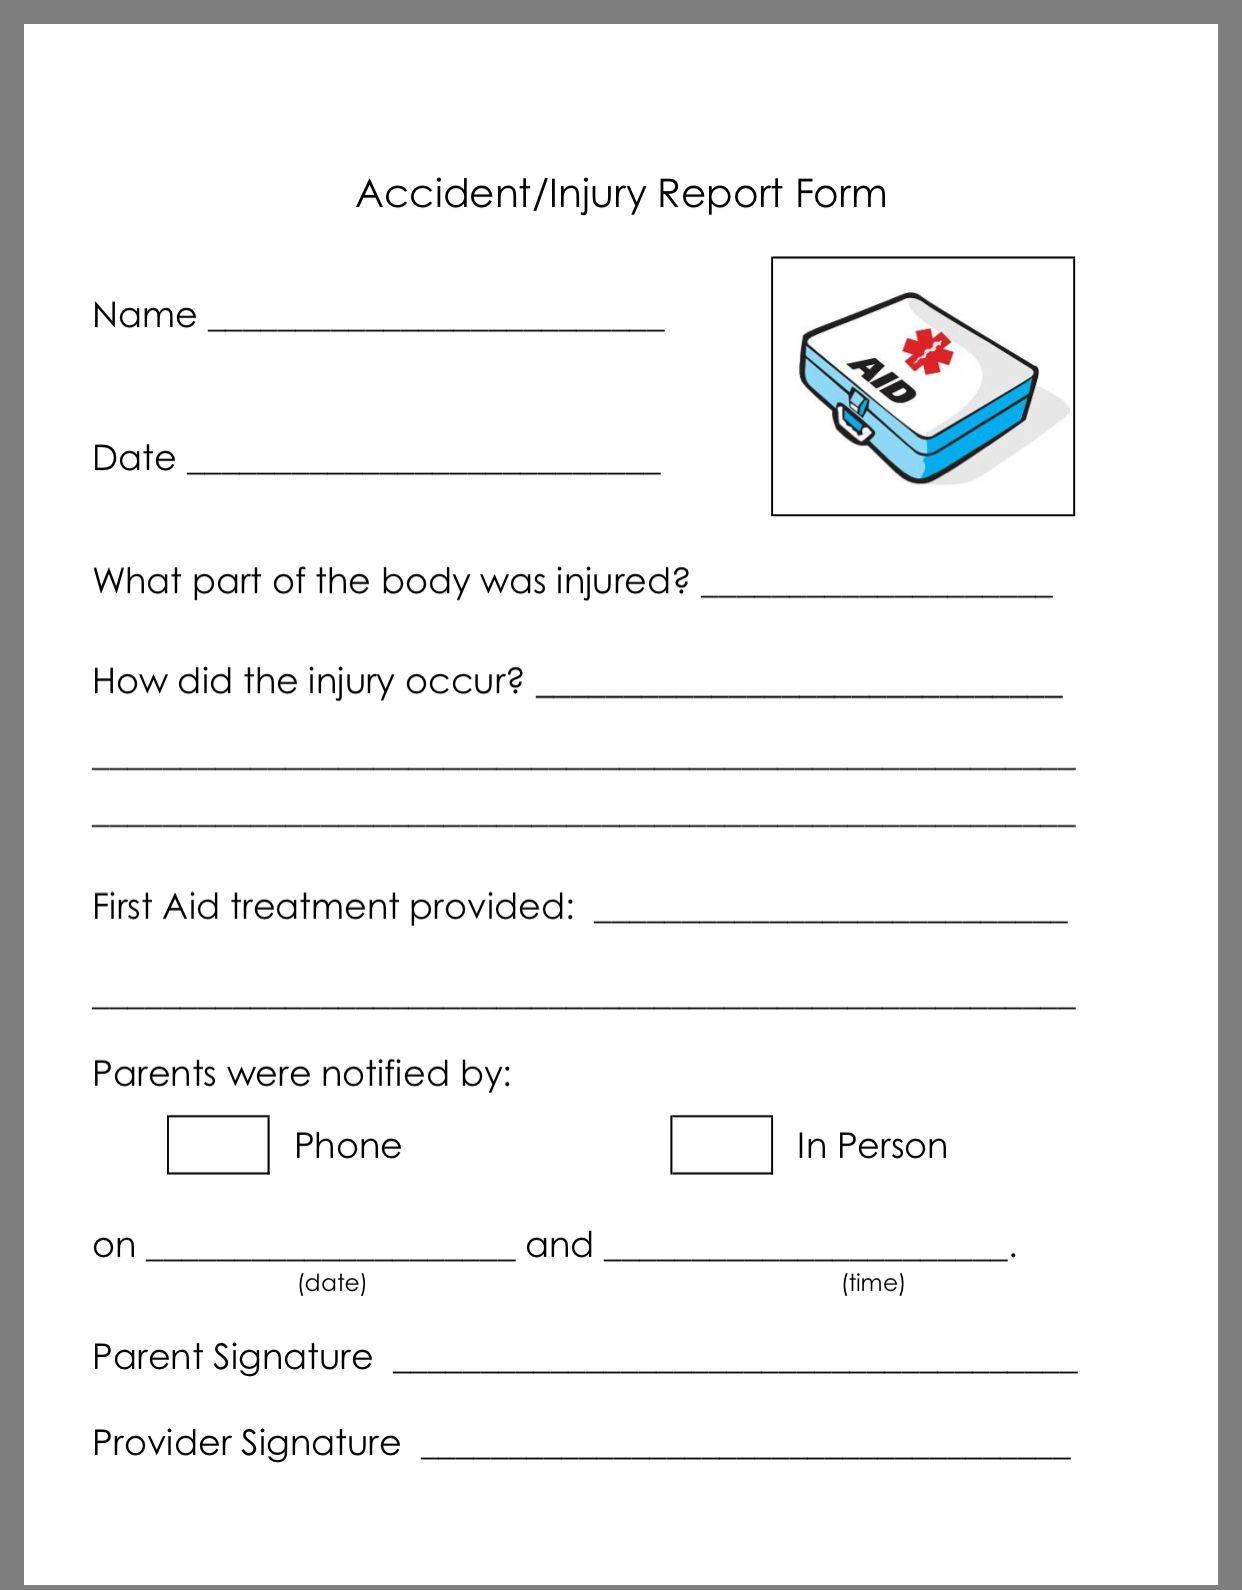 Pin By Krys Jenn On Preschool Classroom Daycare Forms Starting